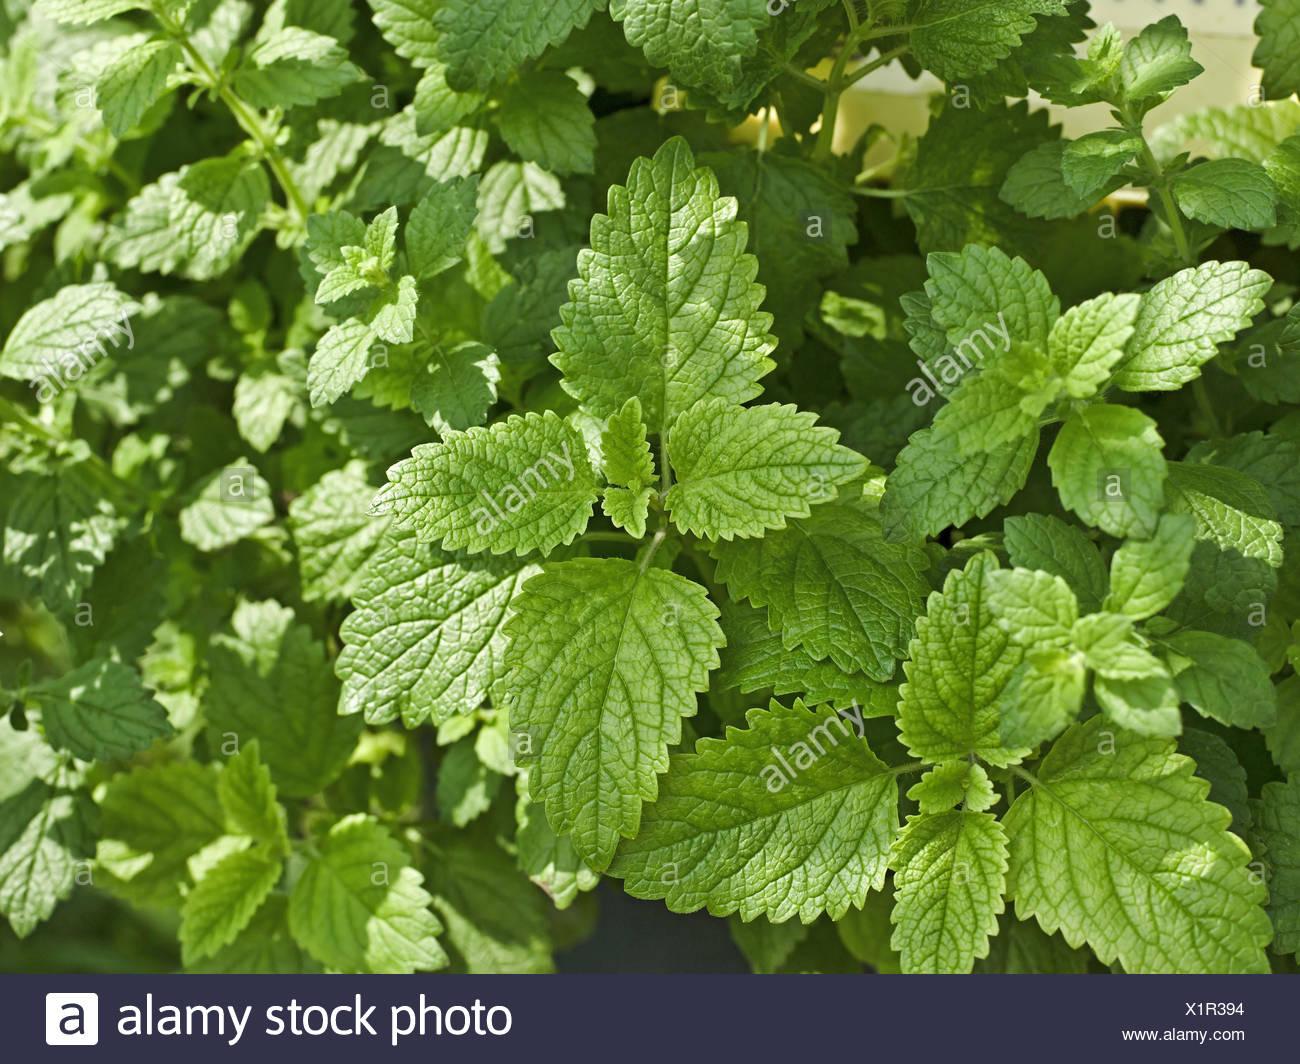 Lemon balm, Melissa officinalis, mint family, Lamiaceae, balm leaves, garden, Stock Photo